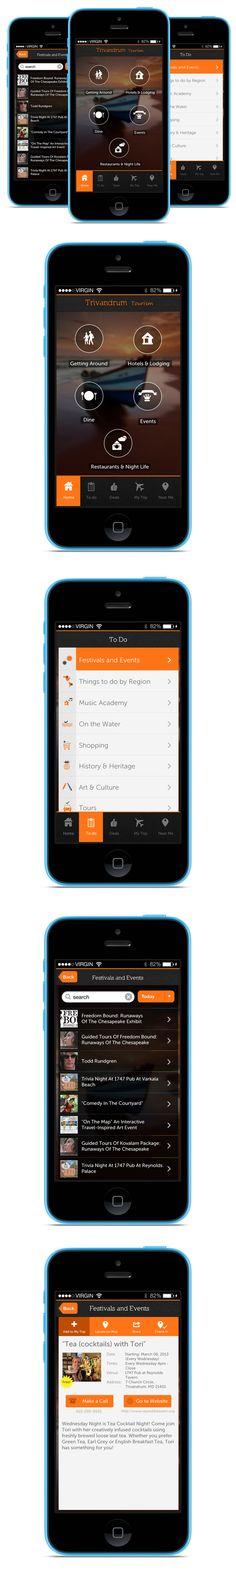 Trivandrum Tourism Mobile App